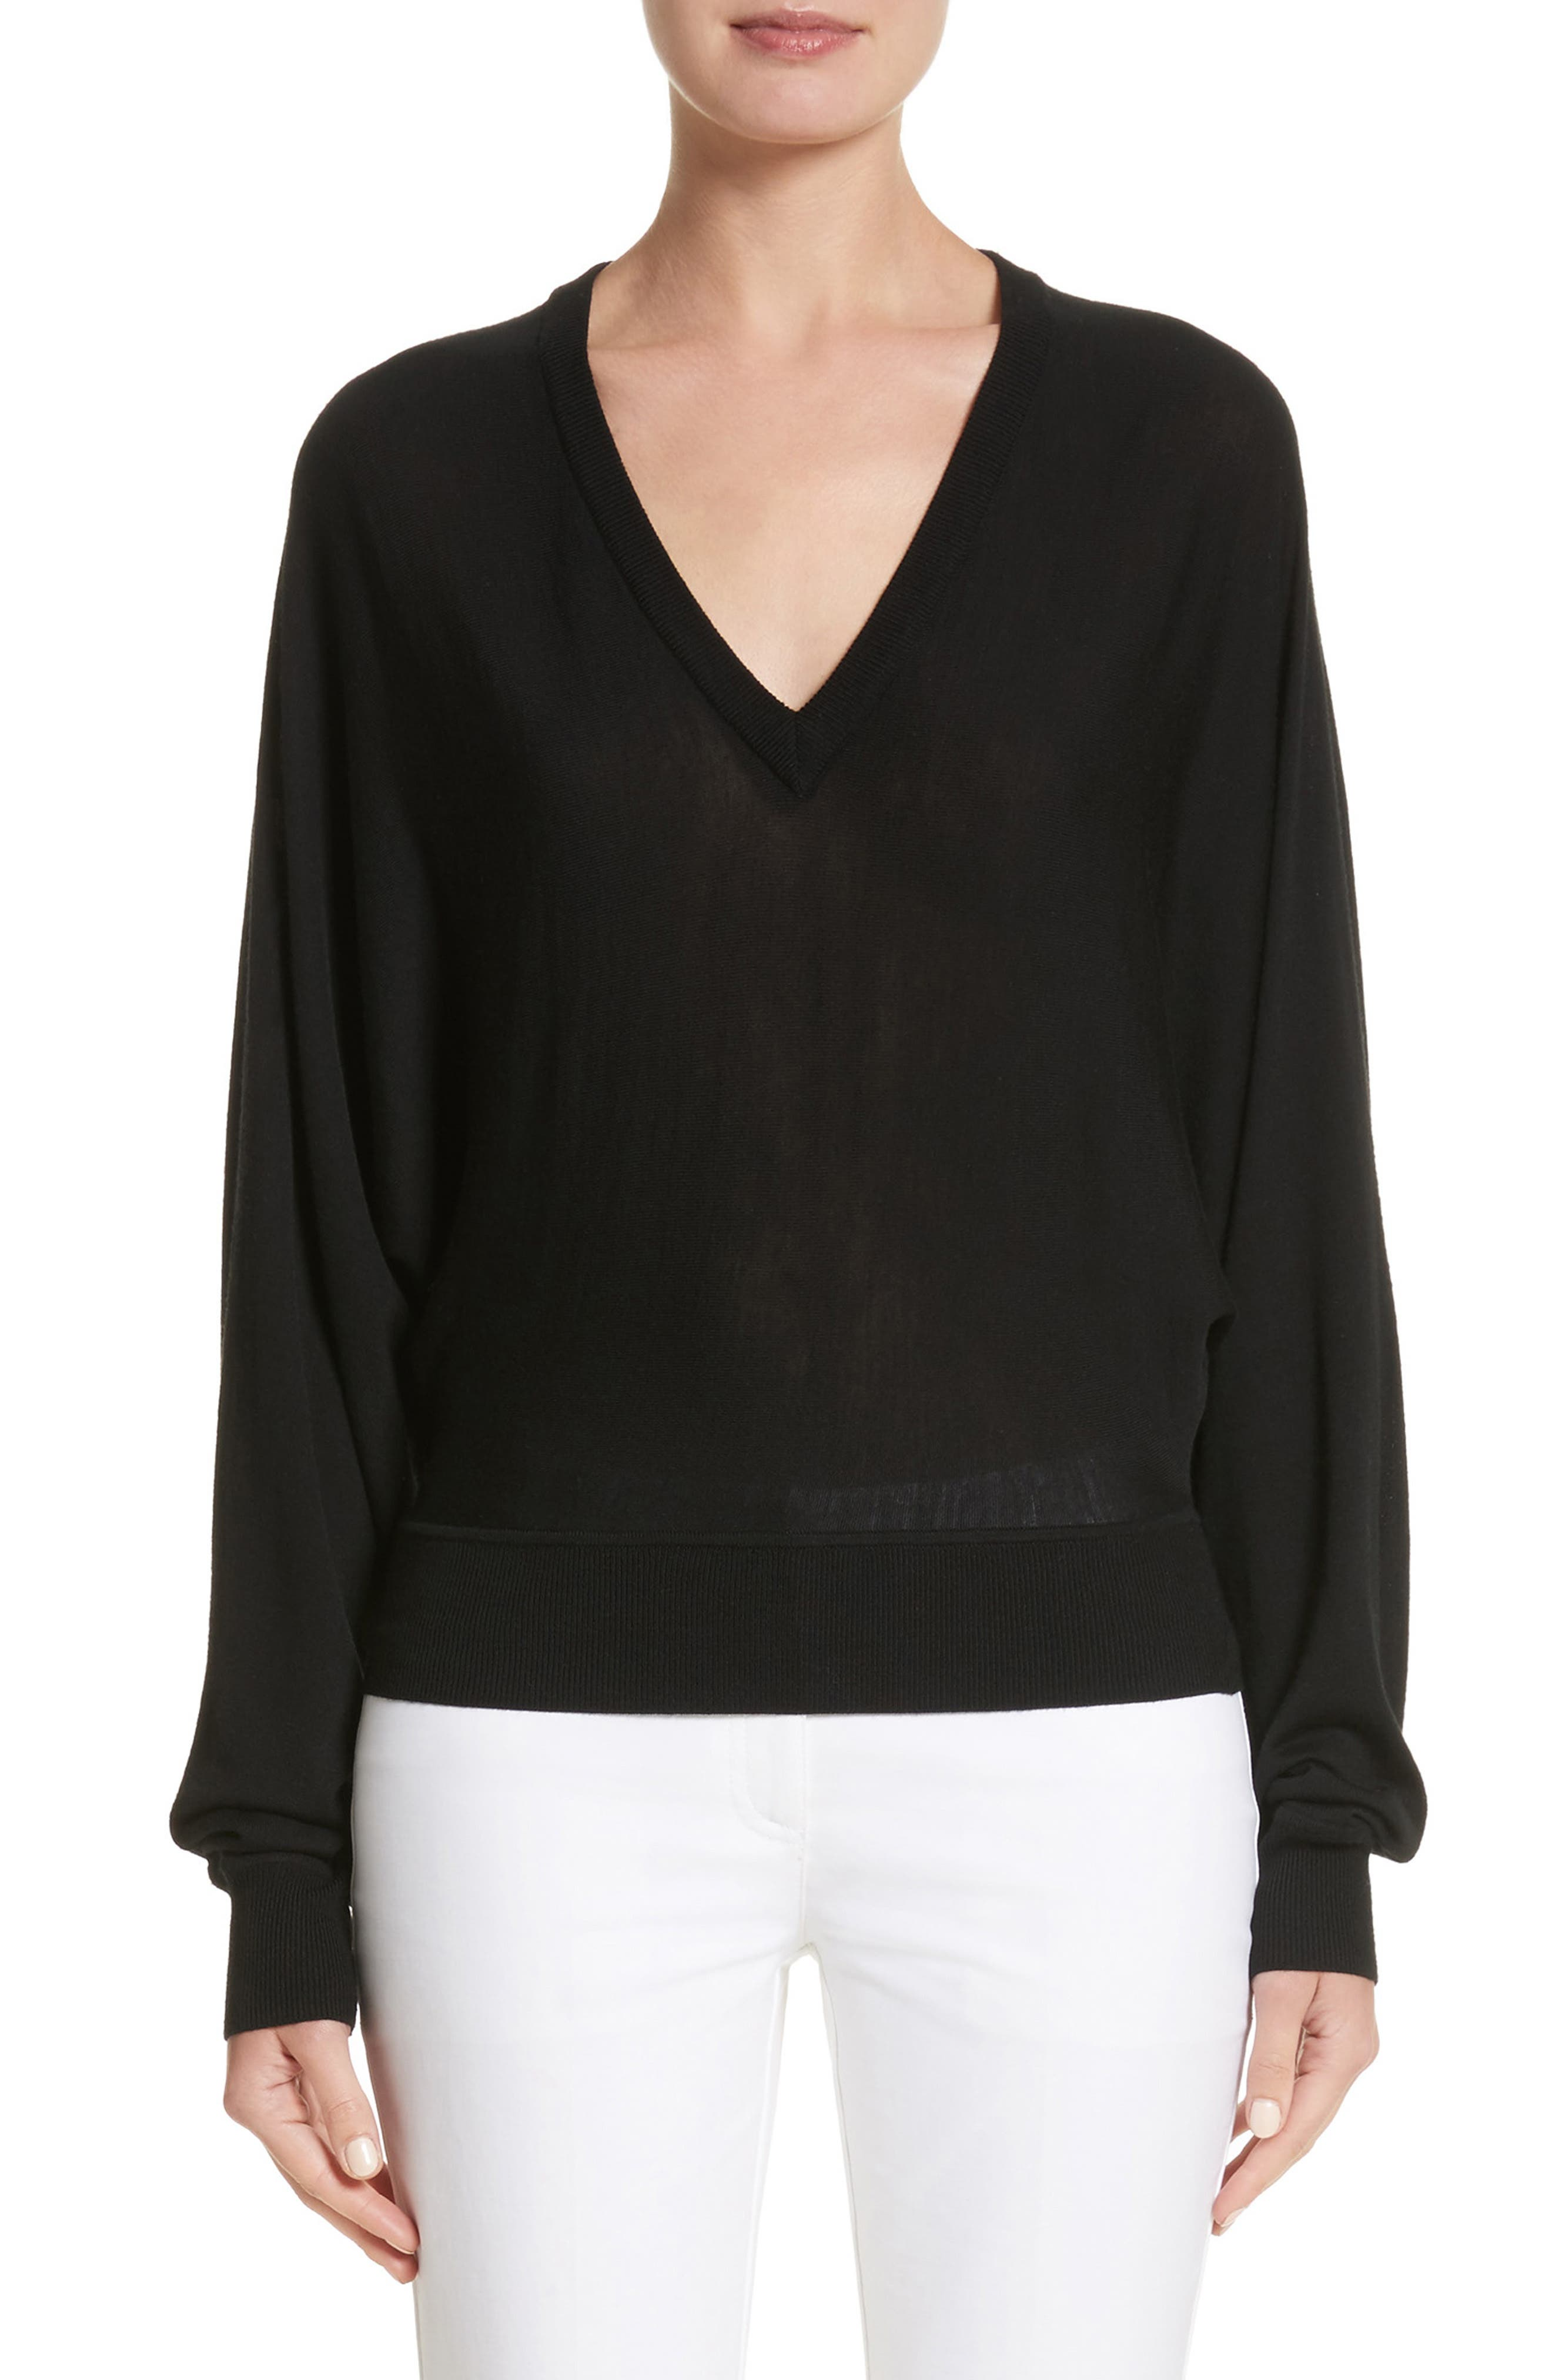 Alternate Image 1 Selected - Michael Kors Merino Wool Blend Dolman Sweater